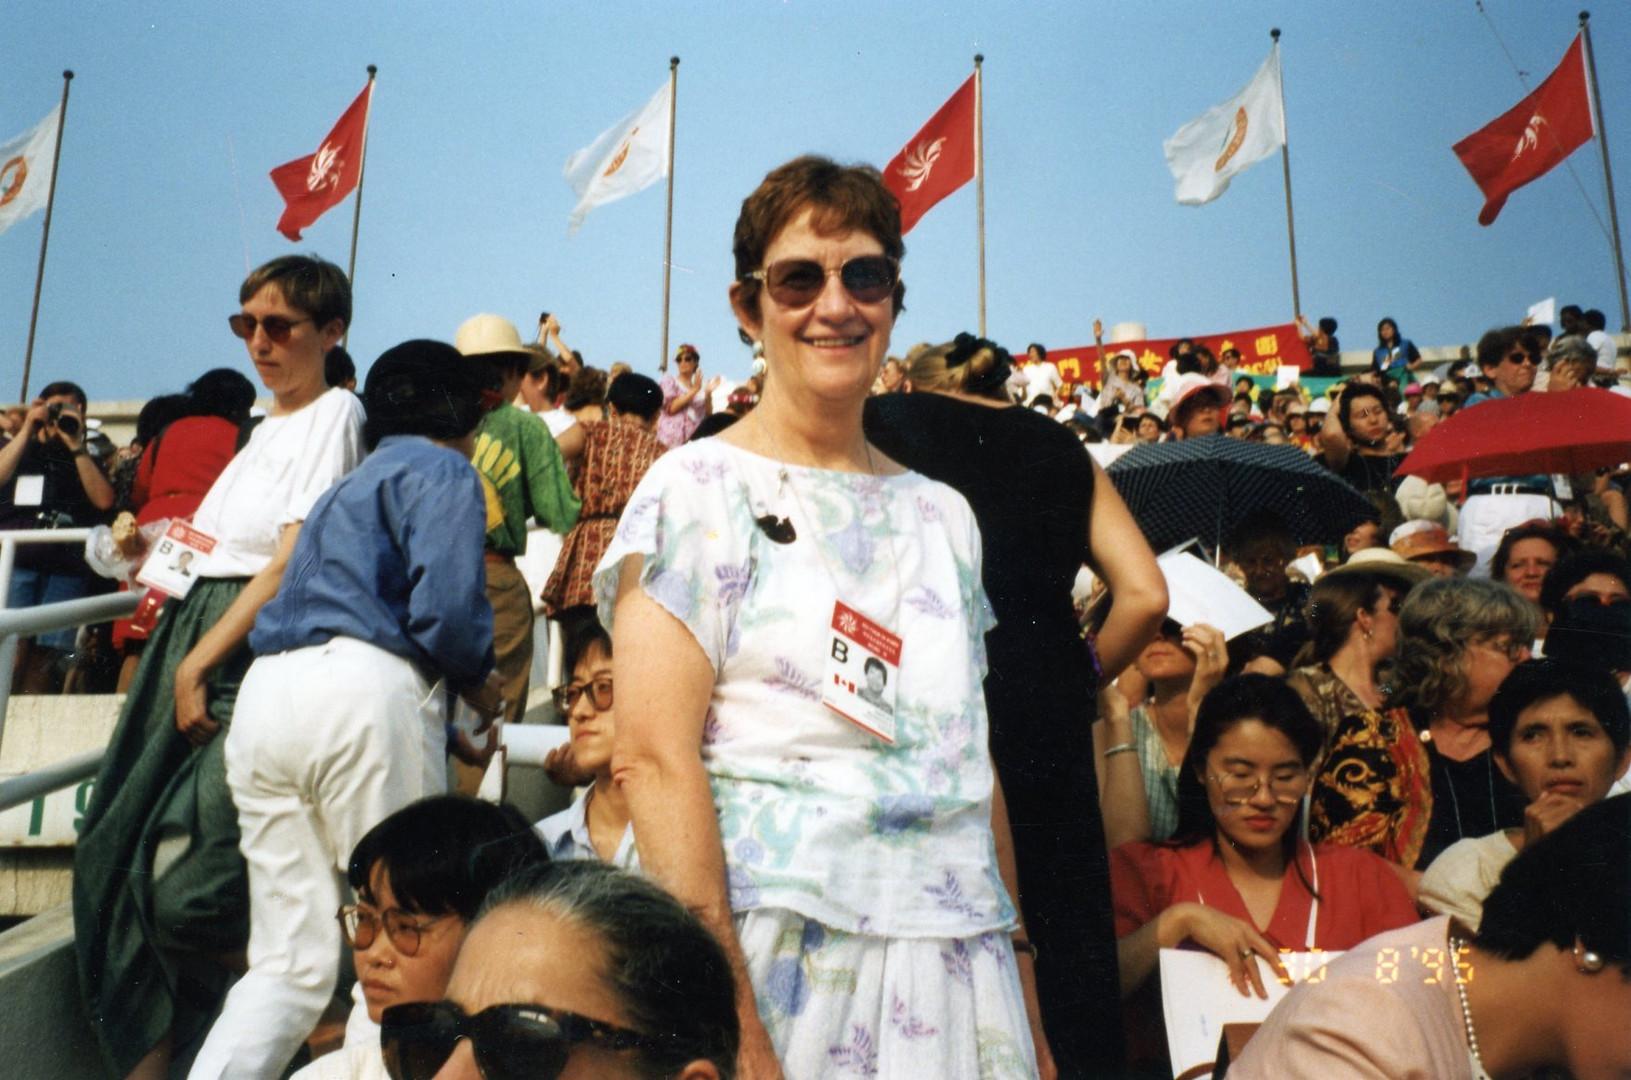 Beijing Conf R osemary1995.jpg